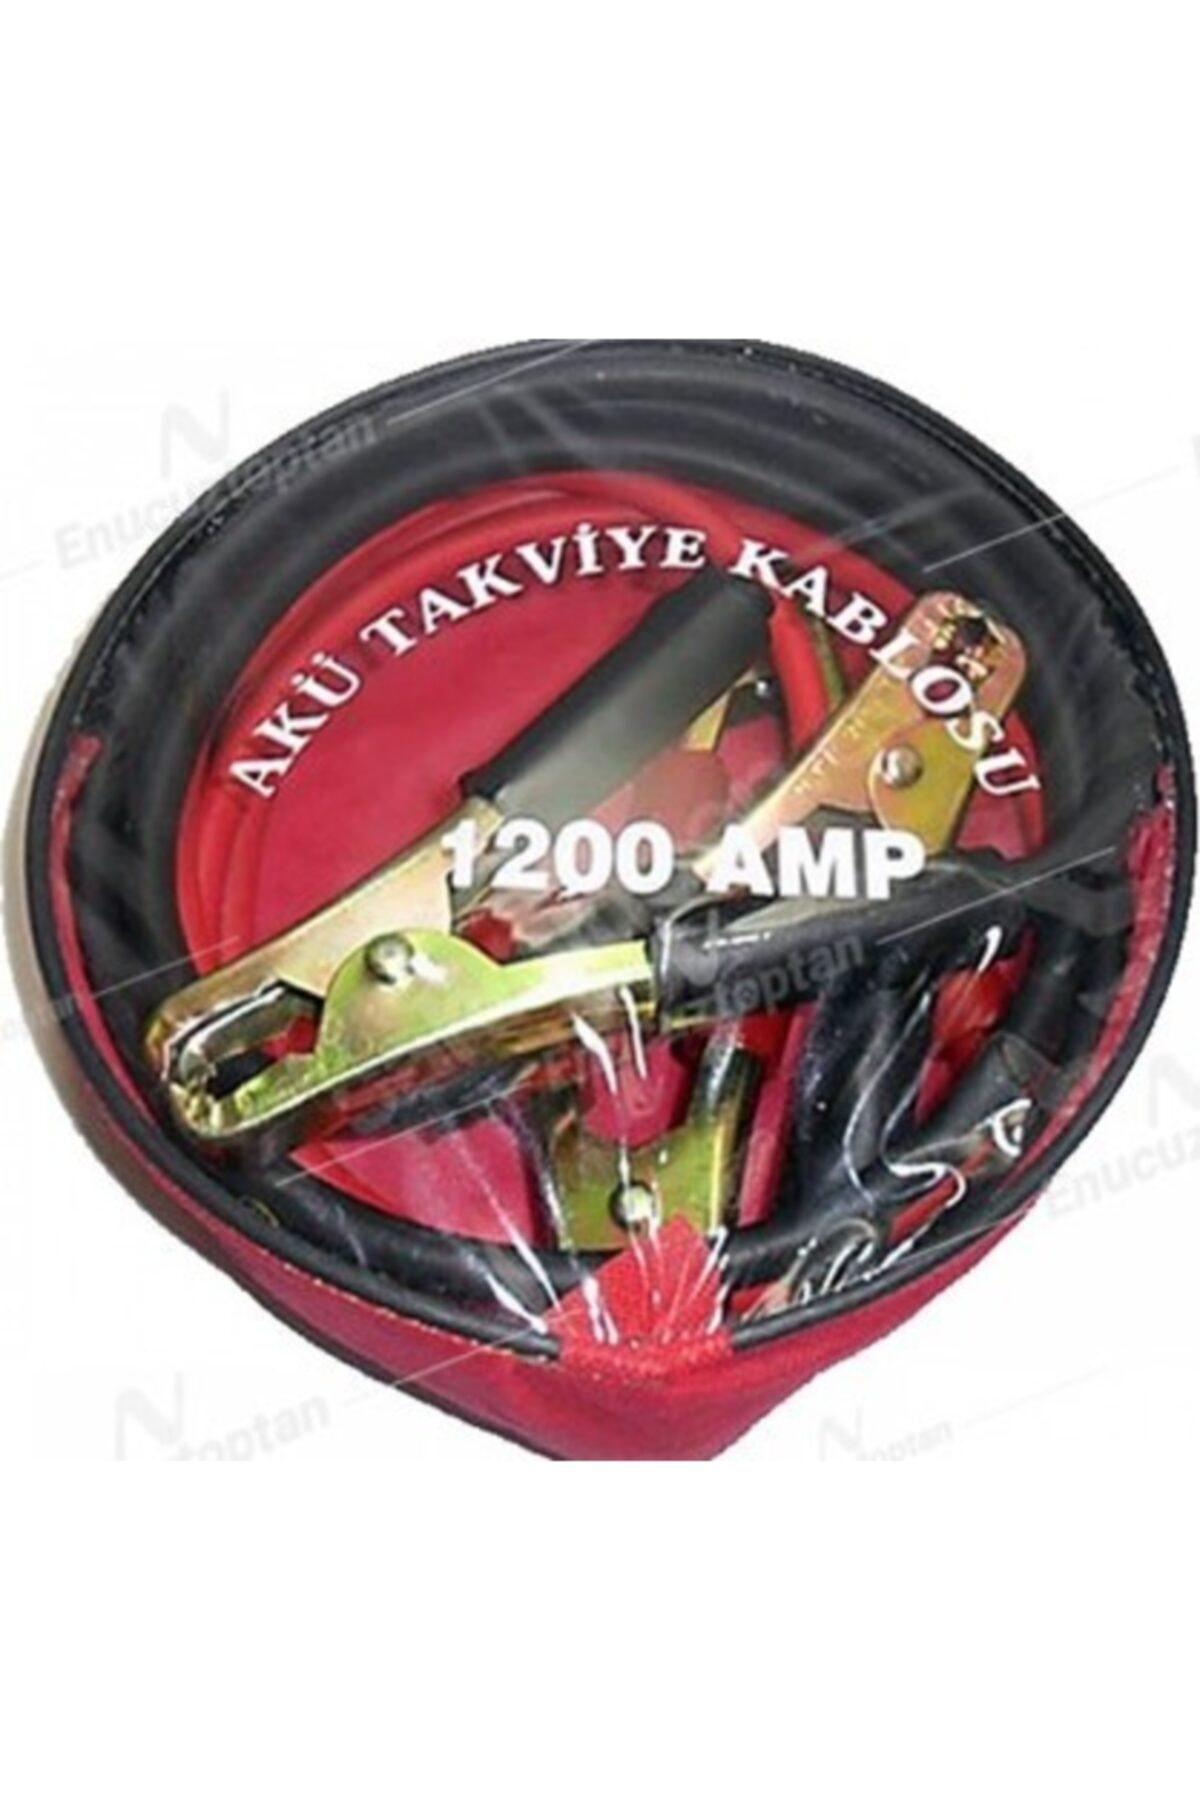 NUMEROUNO Akü Takviye Kablosu 50mm 1200 Amper 2.3 Metre Numereuno 1